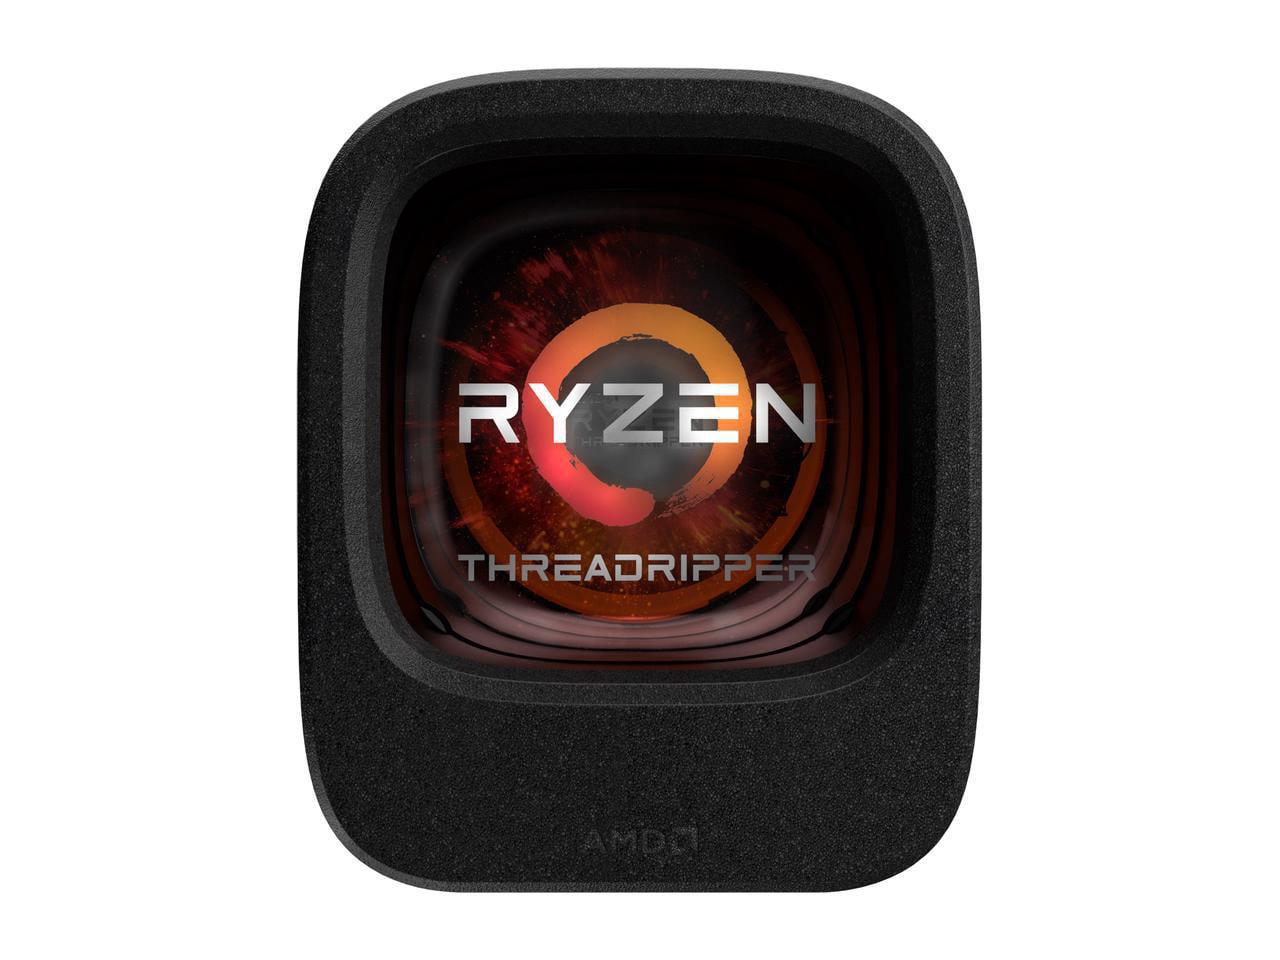 AMD RYZEN Threadripper 1920X 3.5 GHz (4.0 GHz boost clocks) 12-Core 24 Threads Socket sTR4 32MB Cache Desktop... by AMD